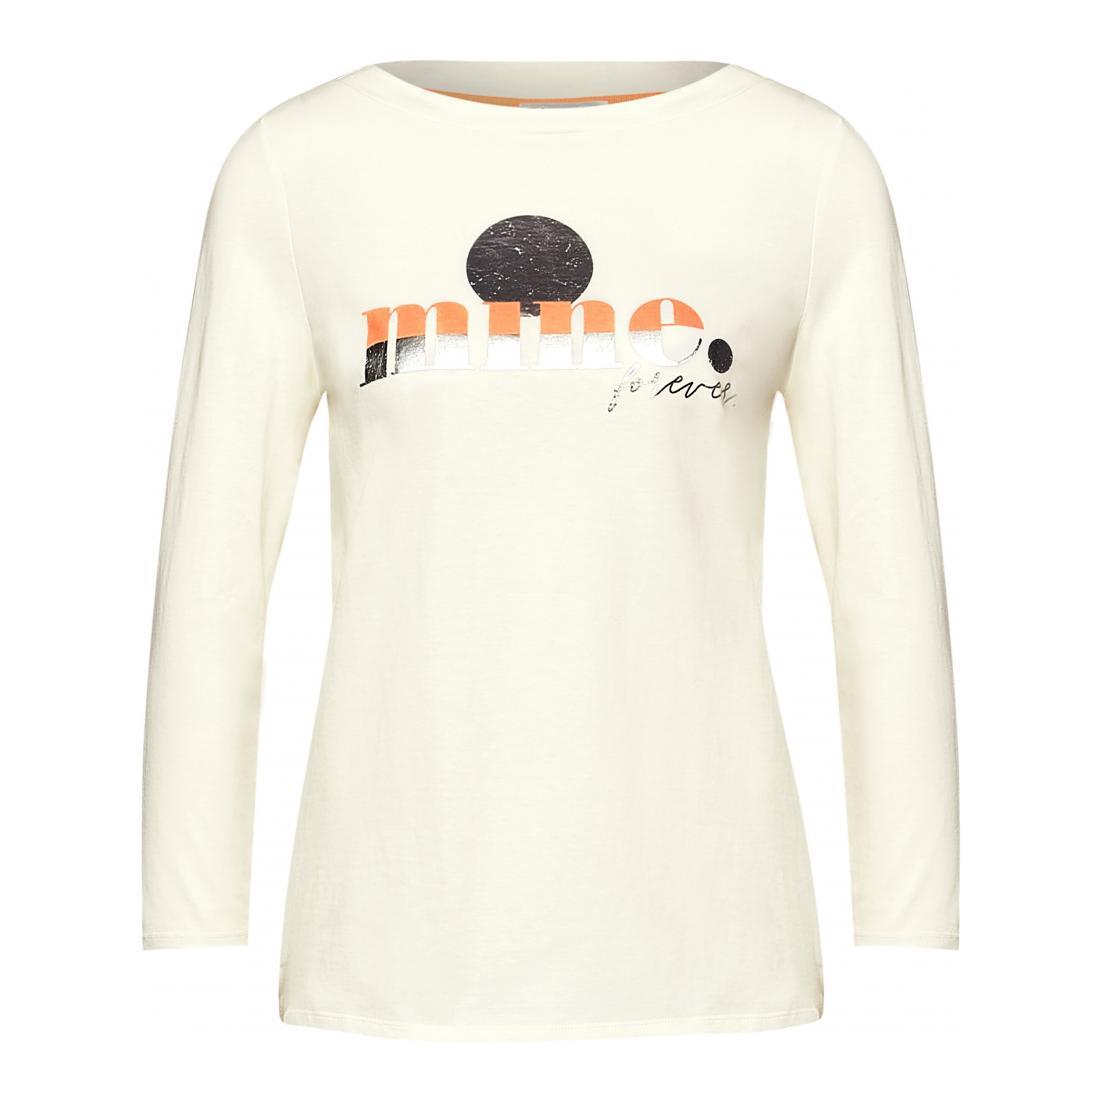 Street One Longsleeves Damen LTD QR mine wording shirt